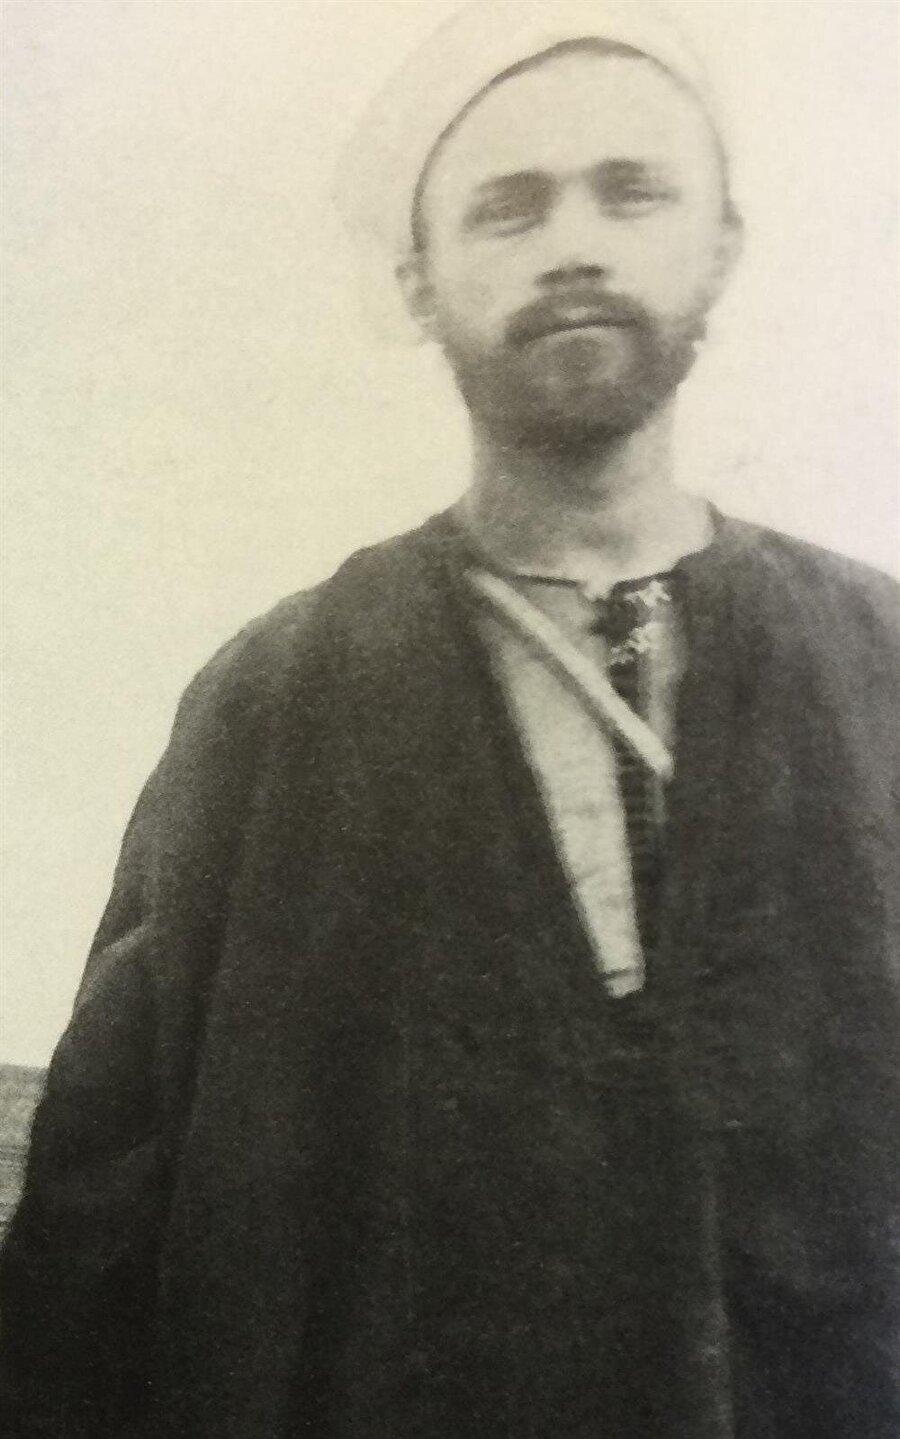 İhtida ettikten sonra Abdülhadi ismini alan ressam İvan Gustav Aguéle.